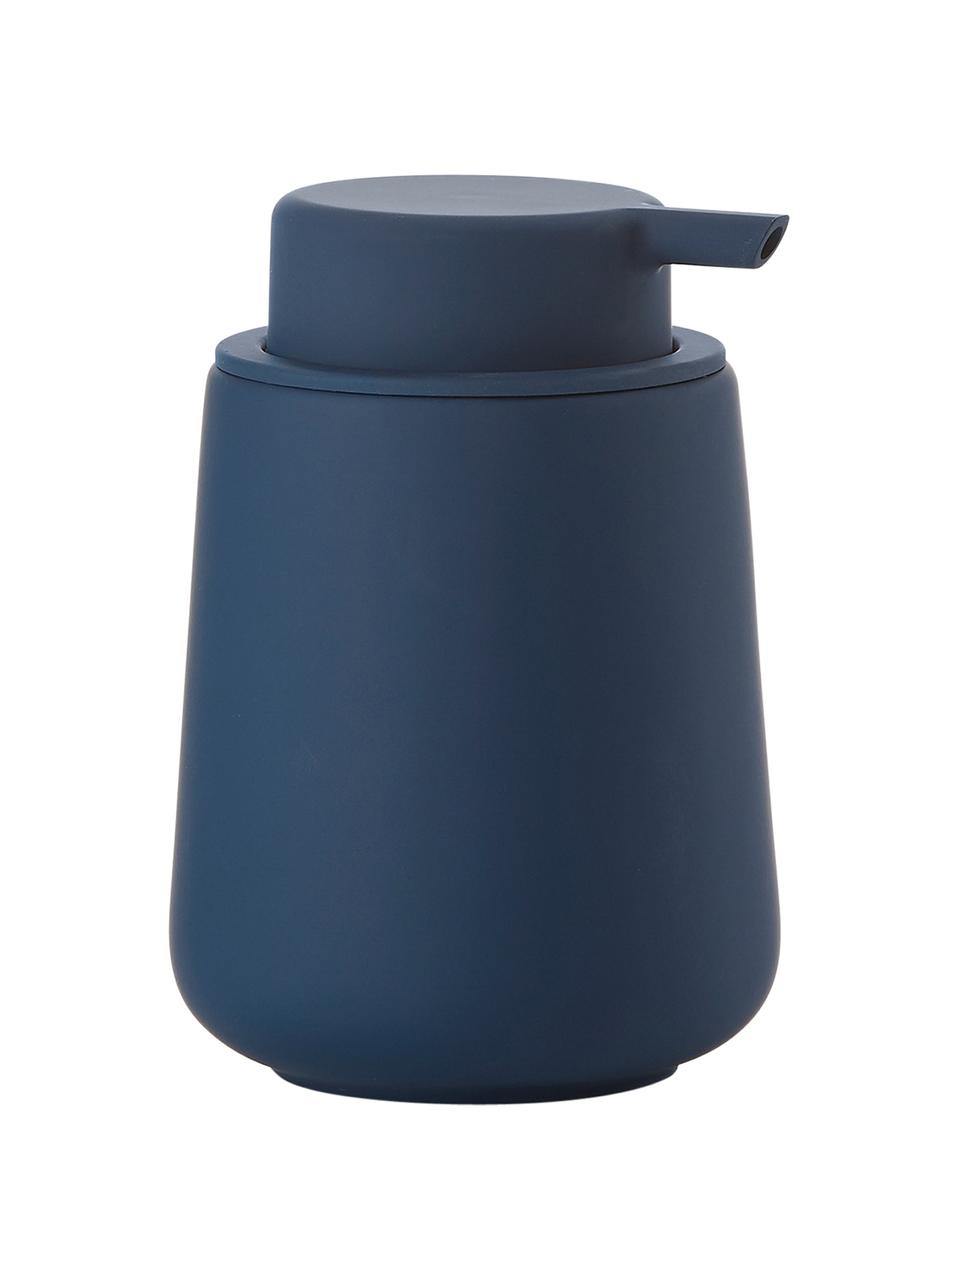 Porzellan-Seifenspender Nova One, Behälter: Porzellan, Königsblau, Ø 8 x H 12 cm